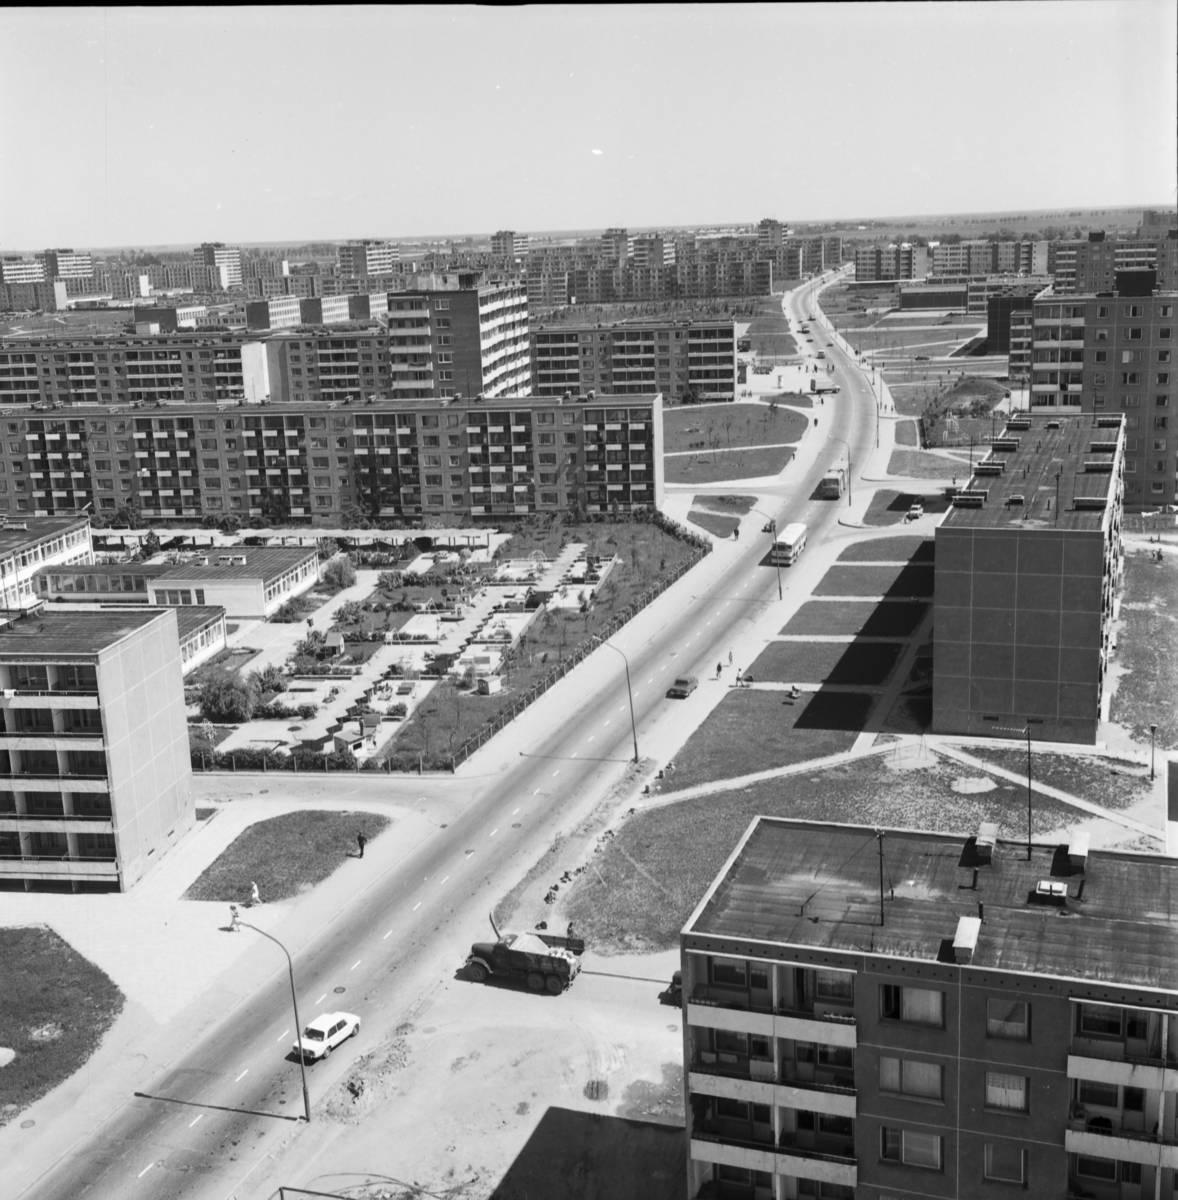 Debreceno gatvės panorama